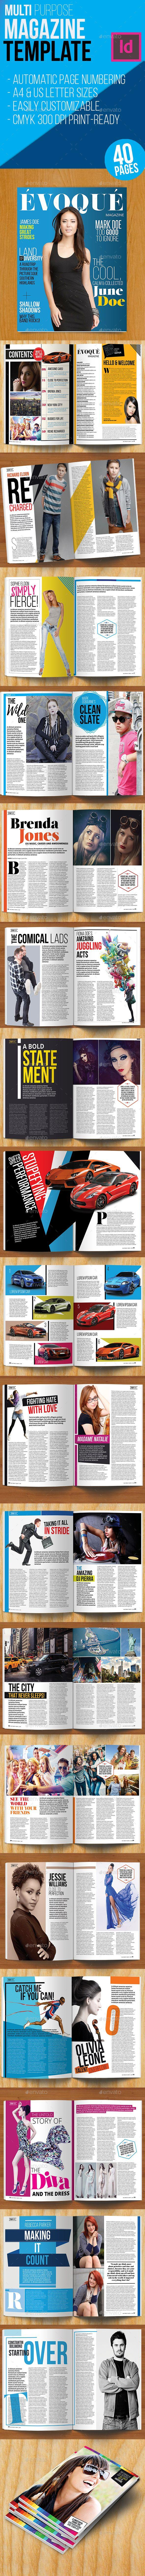 162 best Magazine | Grids & Templates images on Pinterest ...